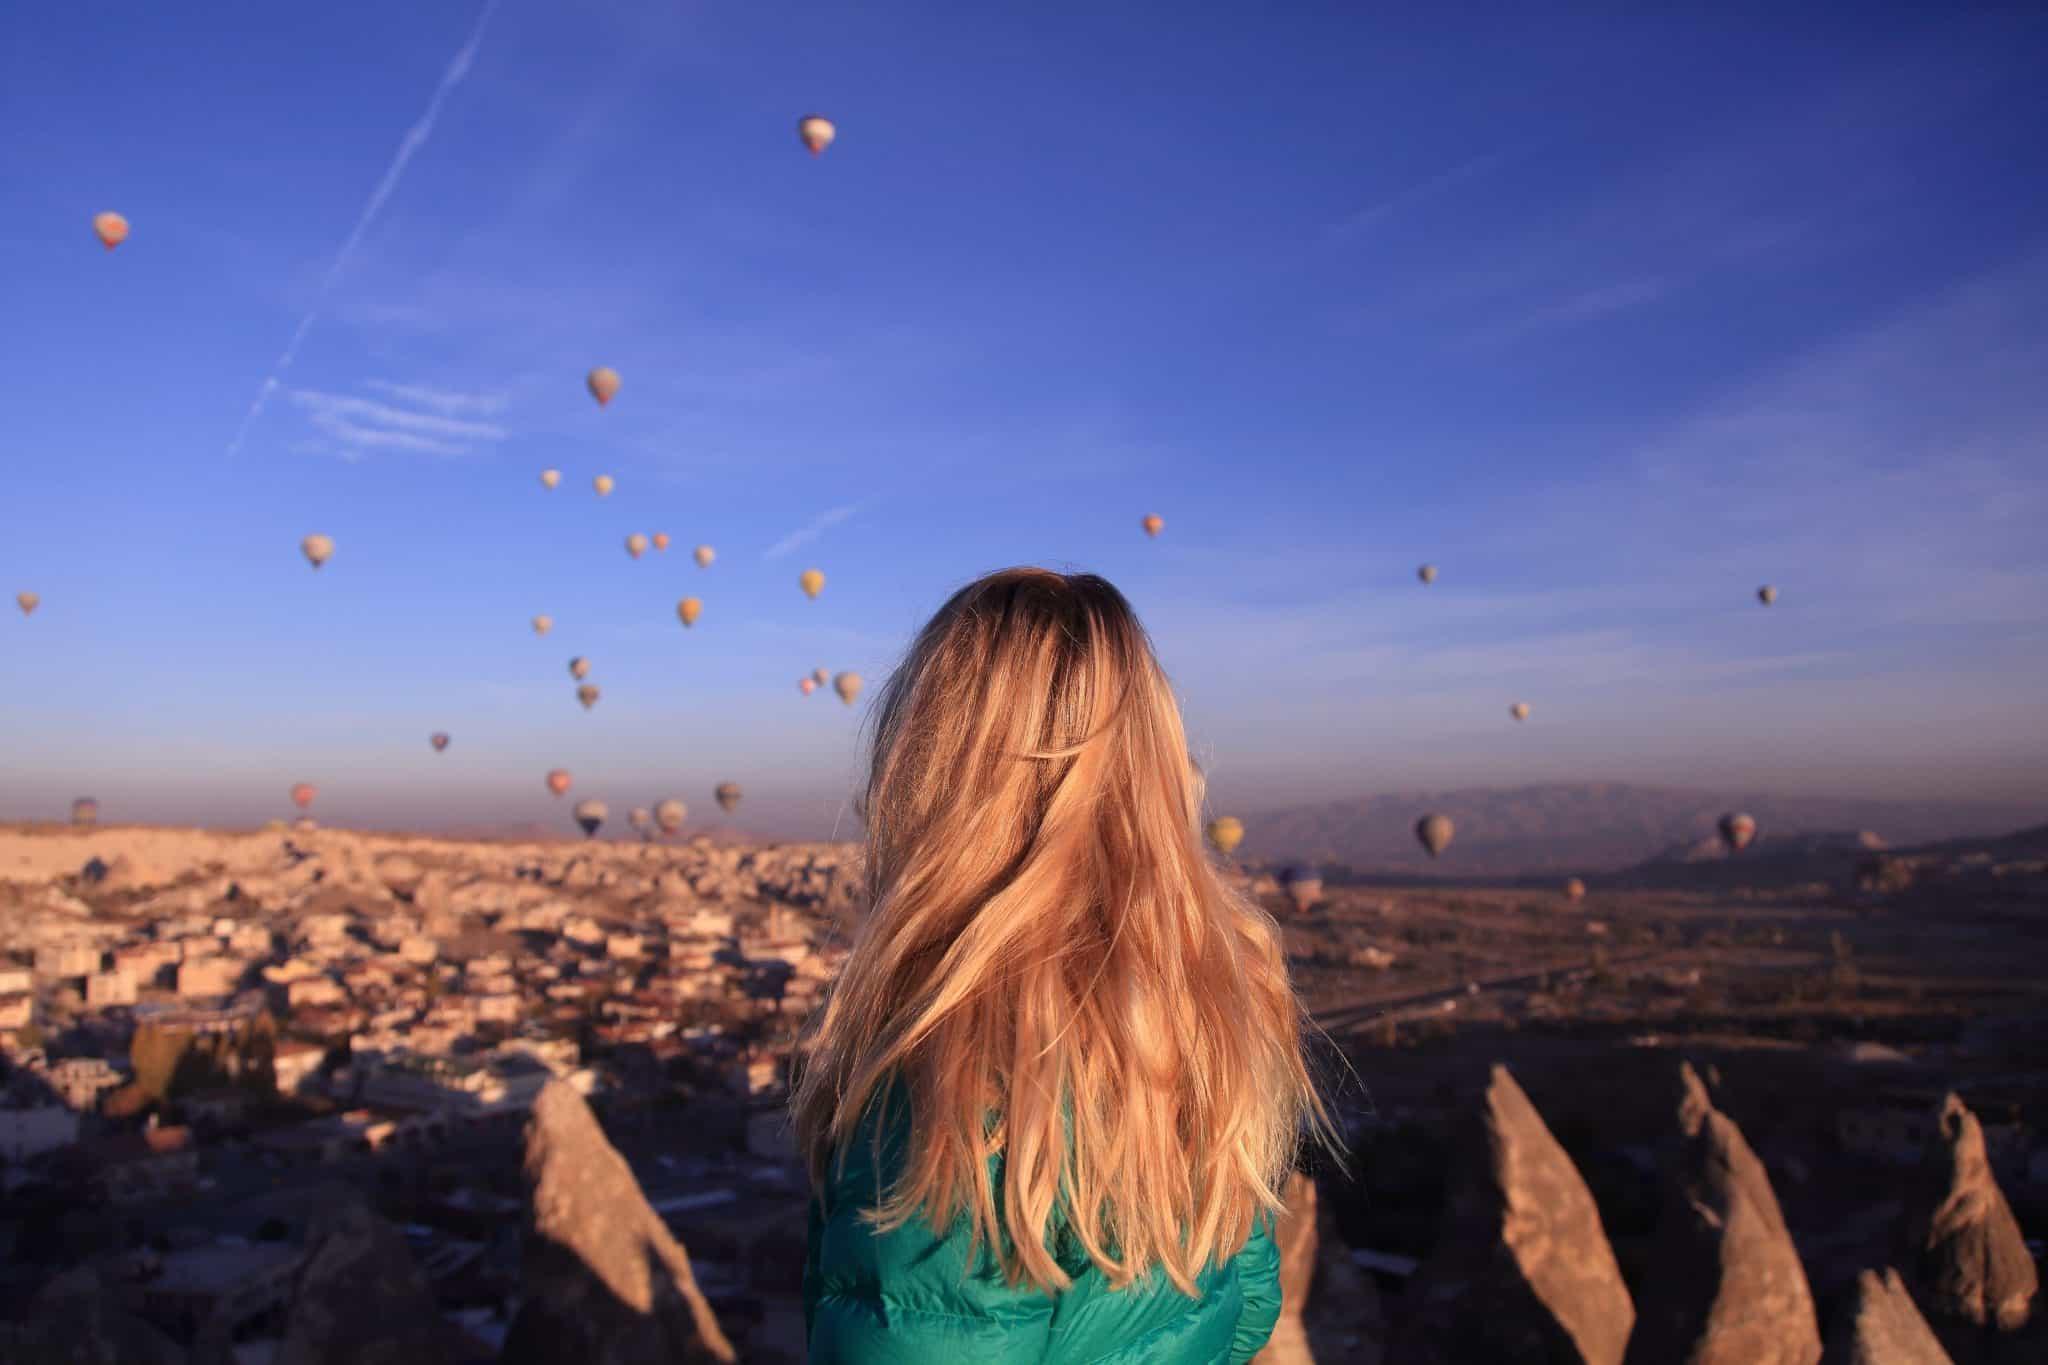 Cappadocia Pictures: Watching the balloons, Cappadocia on a budget